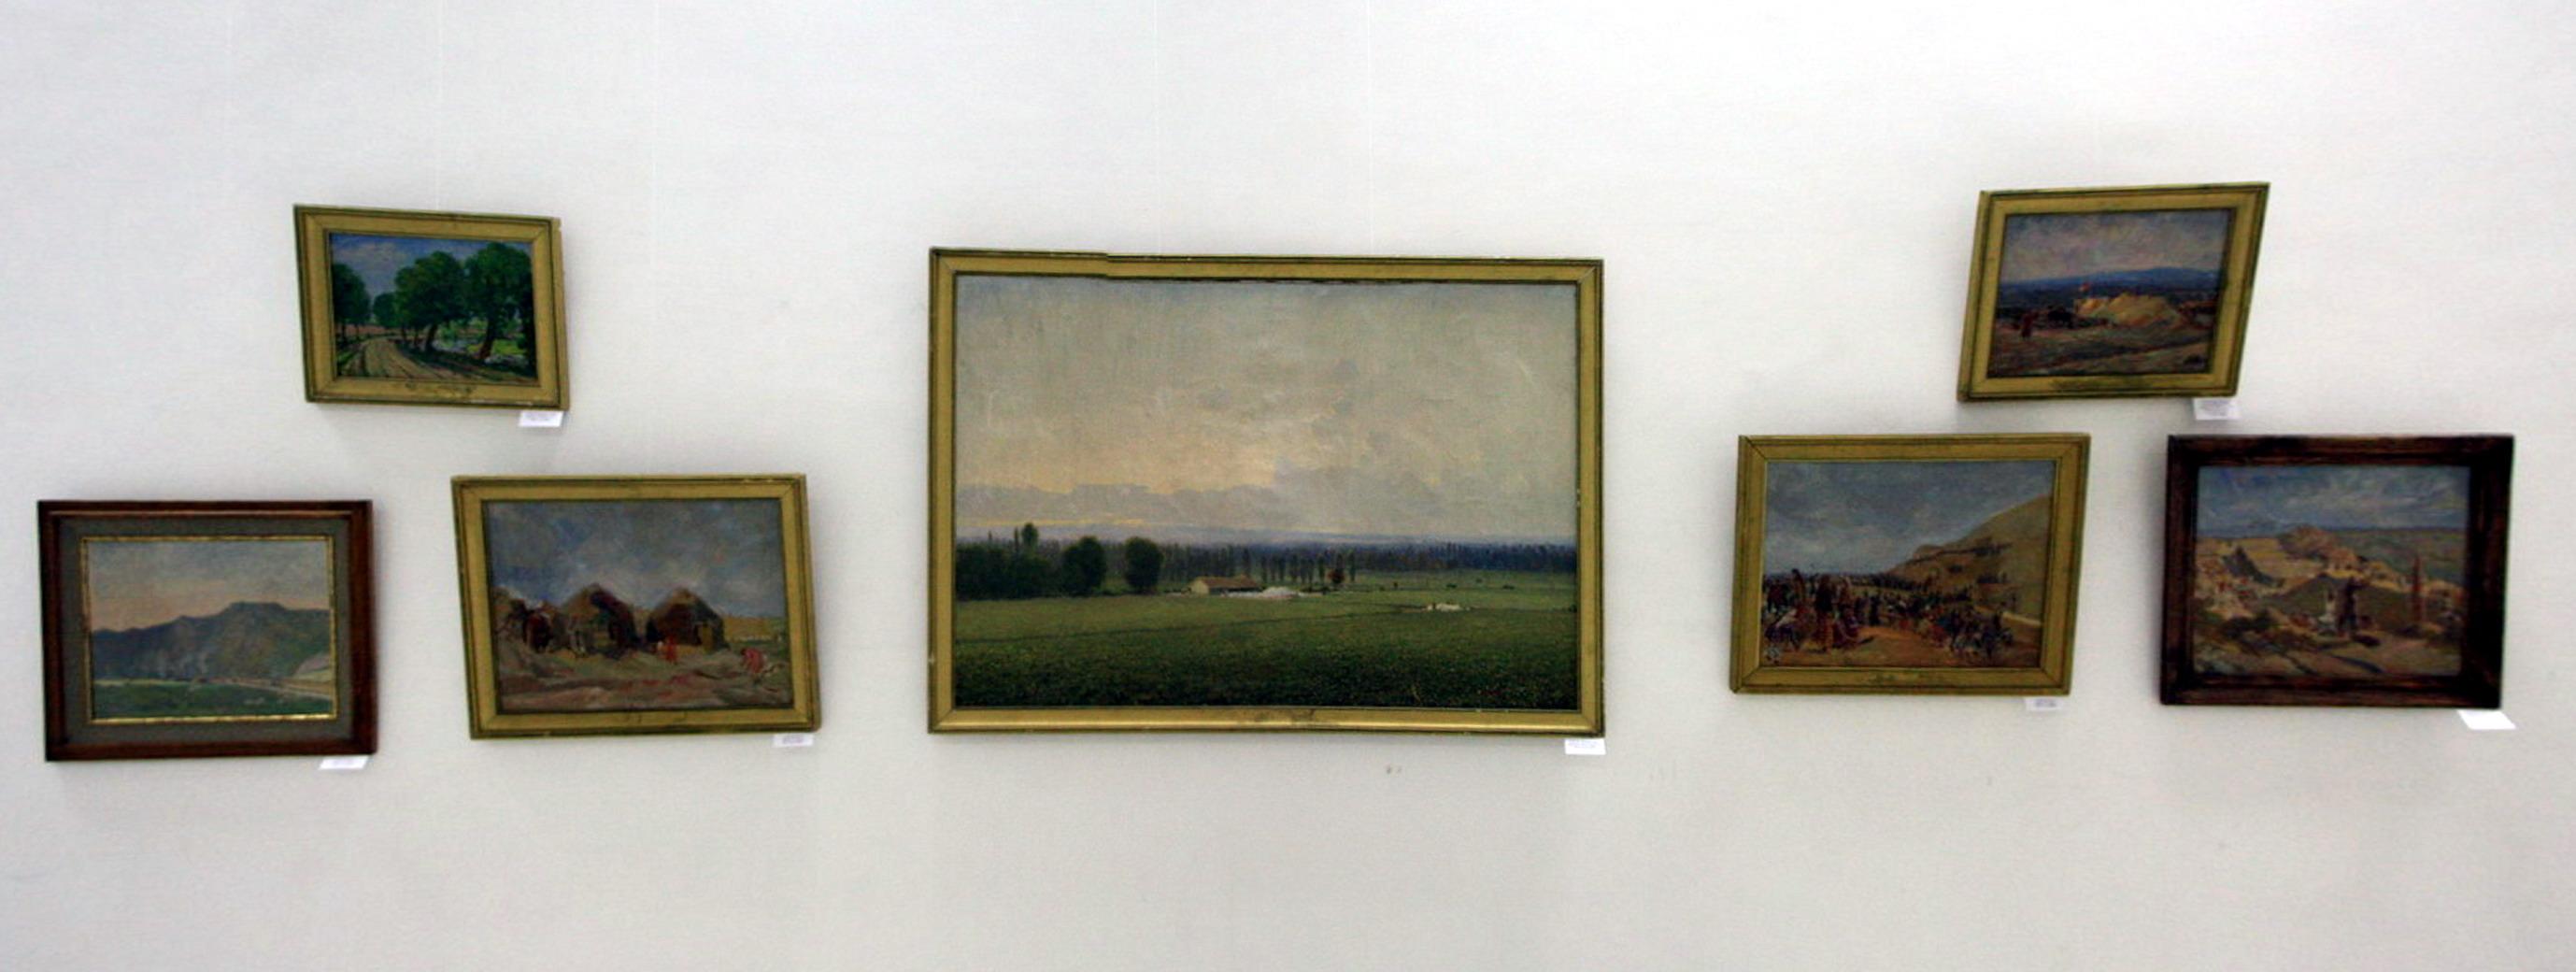 Экспозиция картин Аринина Михаила 1.